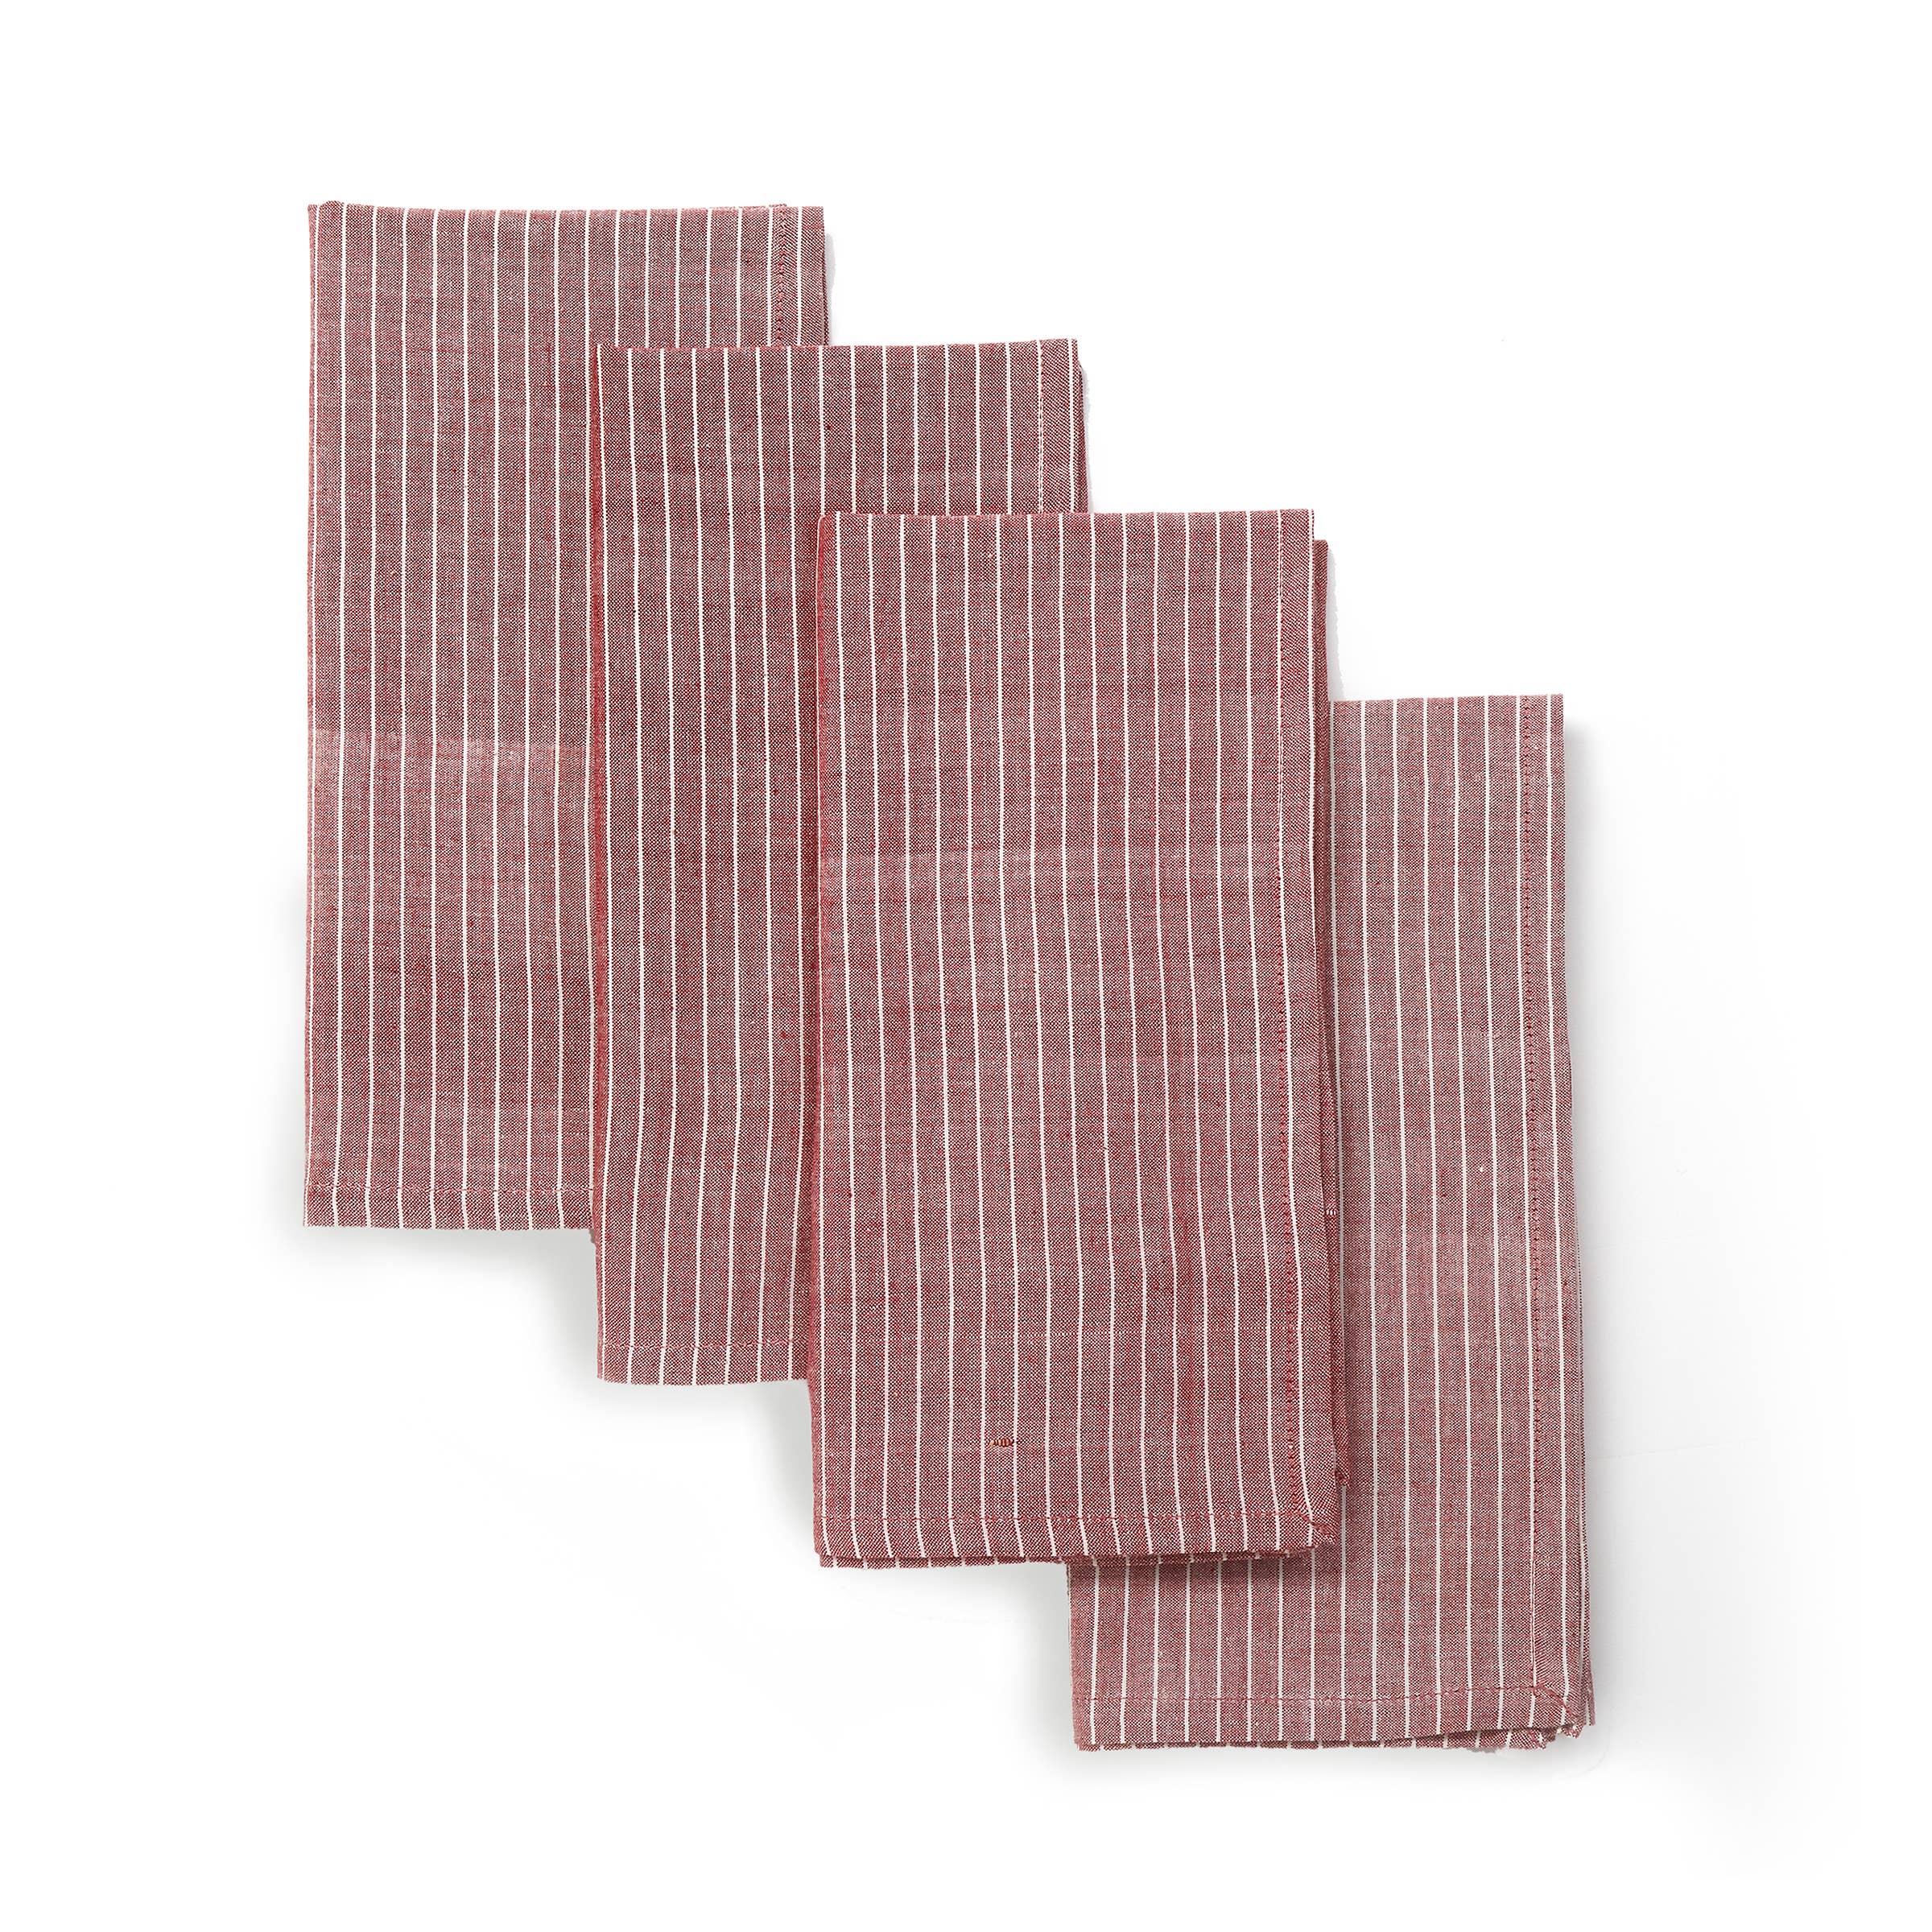 SWEET MAPLE Napkin (set of 4), Soft Handwoven Cotton | Trada Marketplace